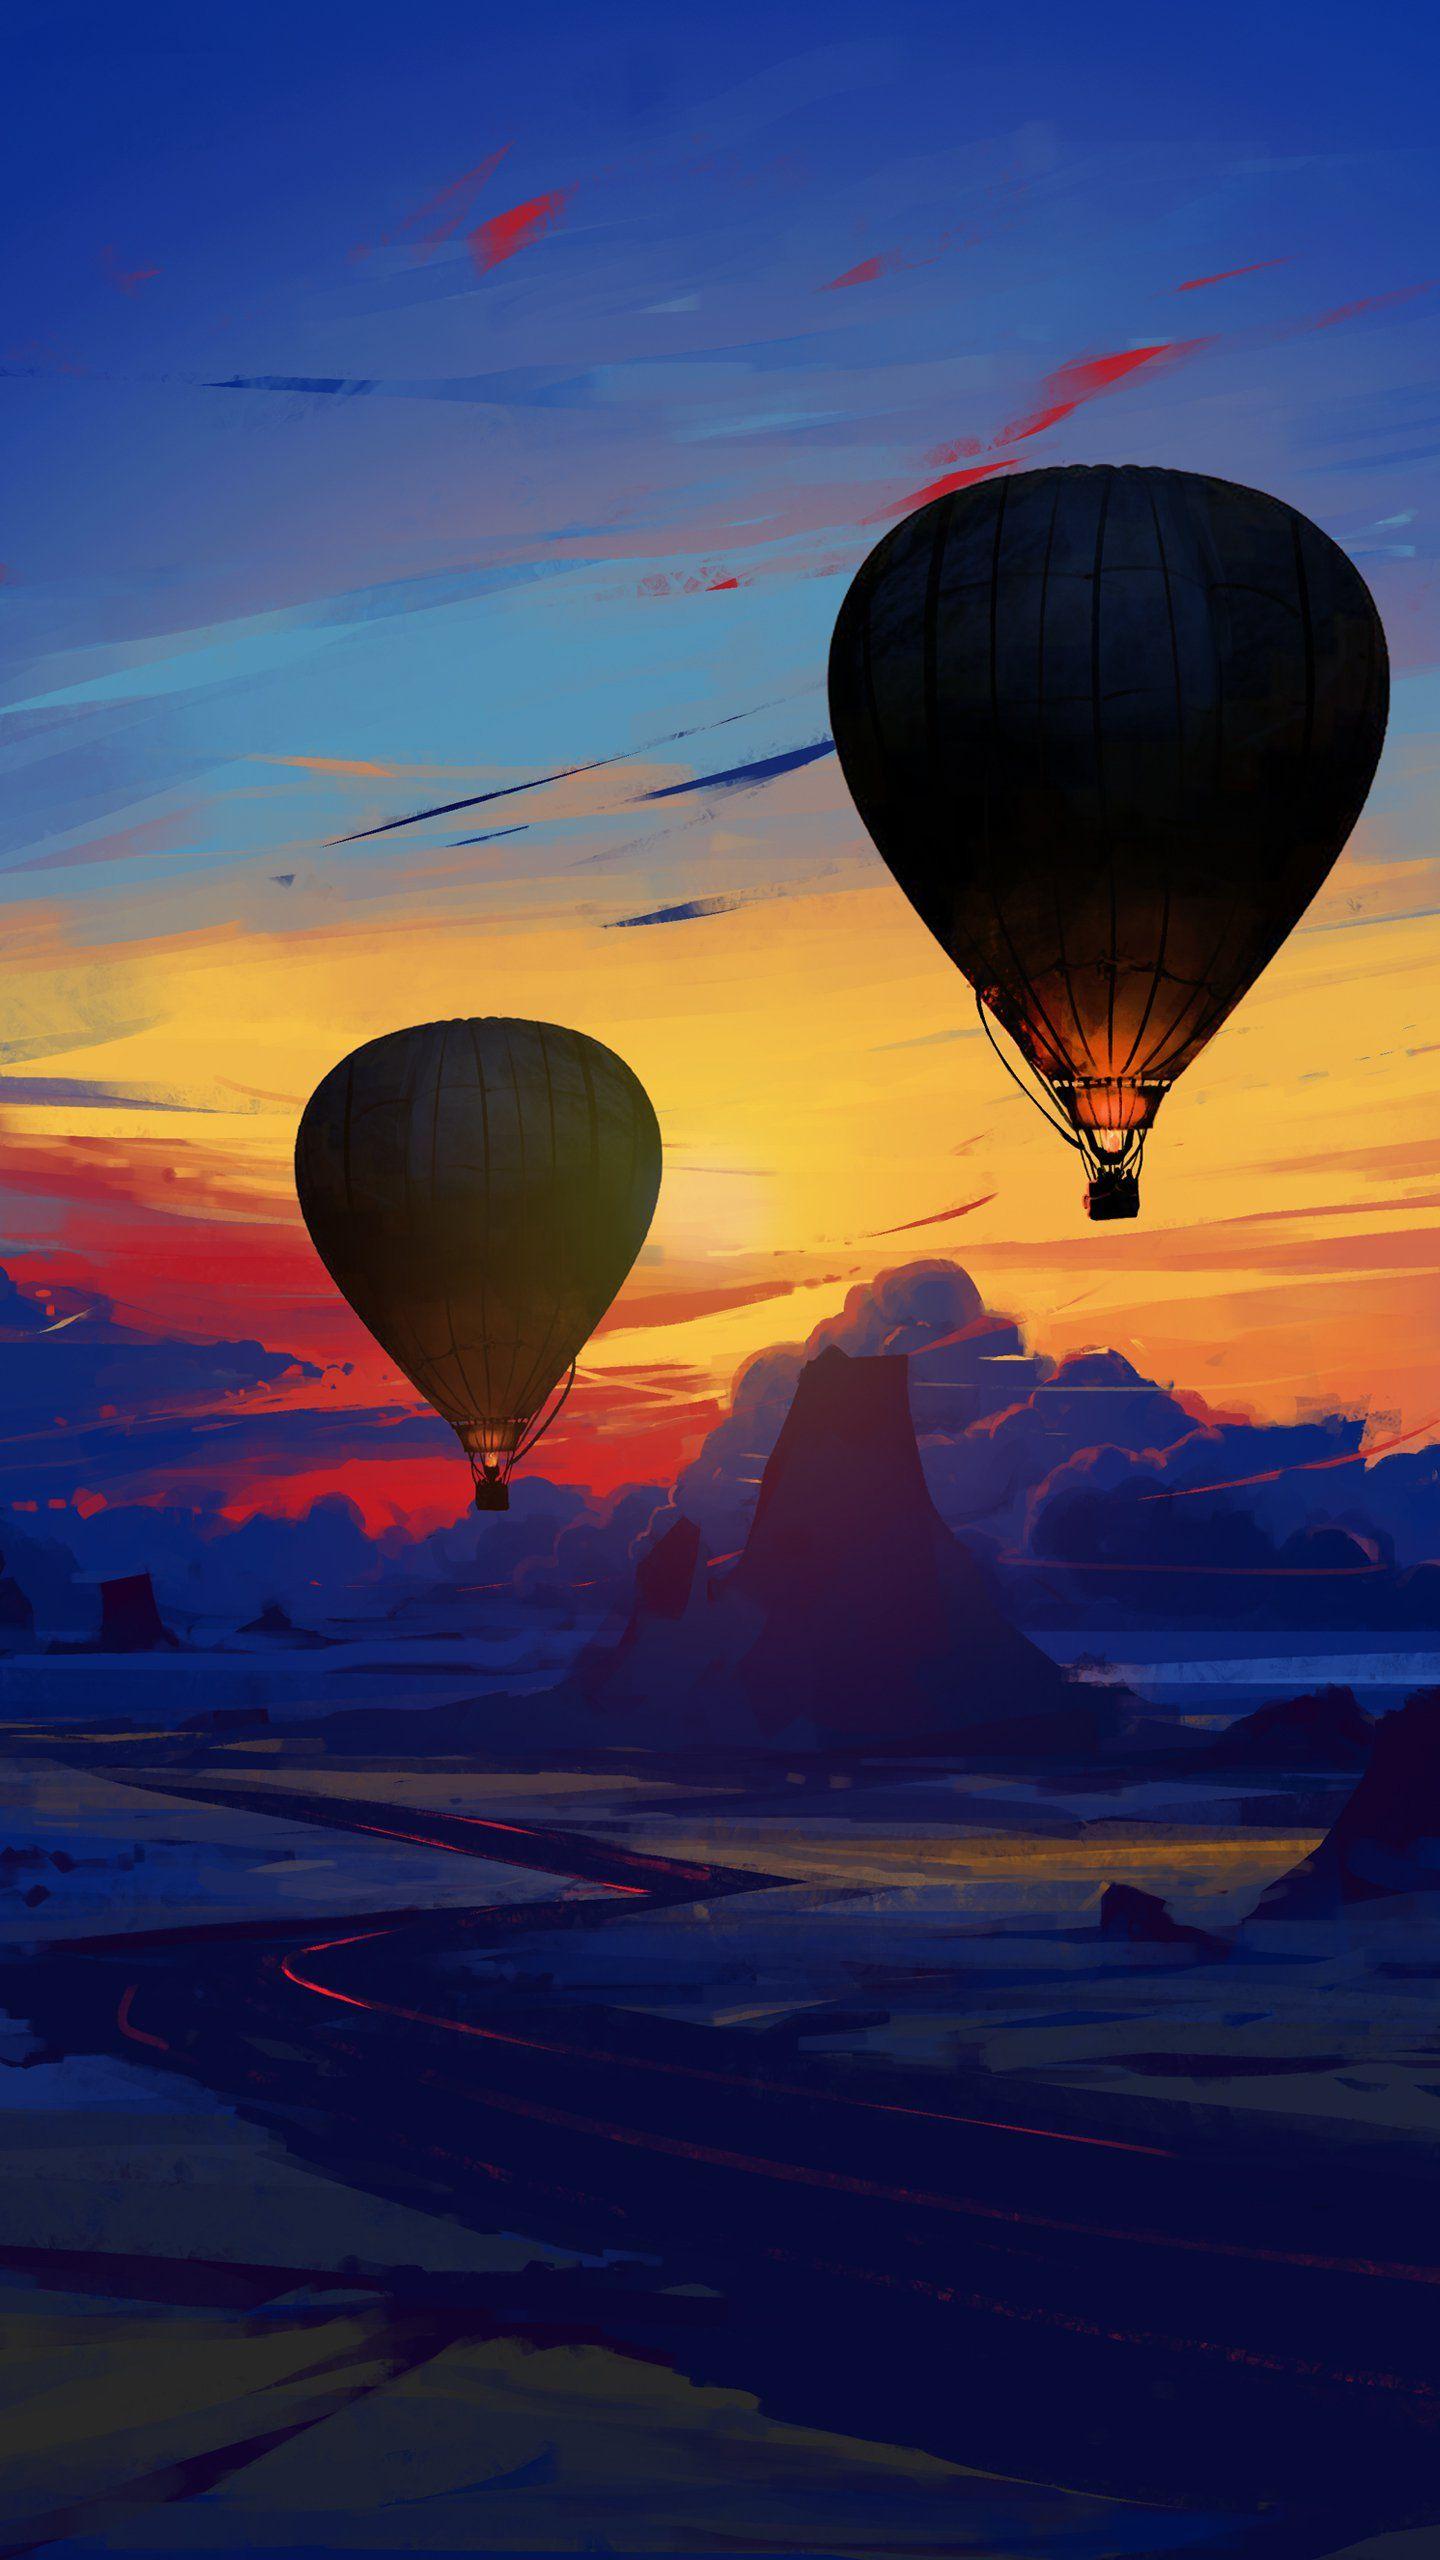 Float high. Screen savers wallpapers backgrounds, Art